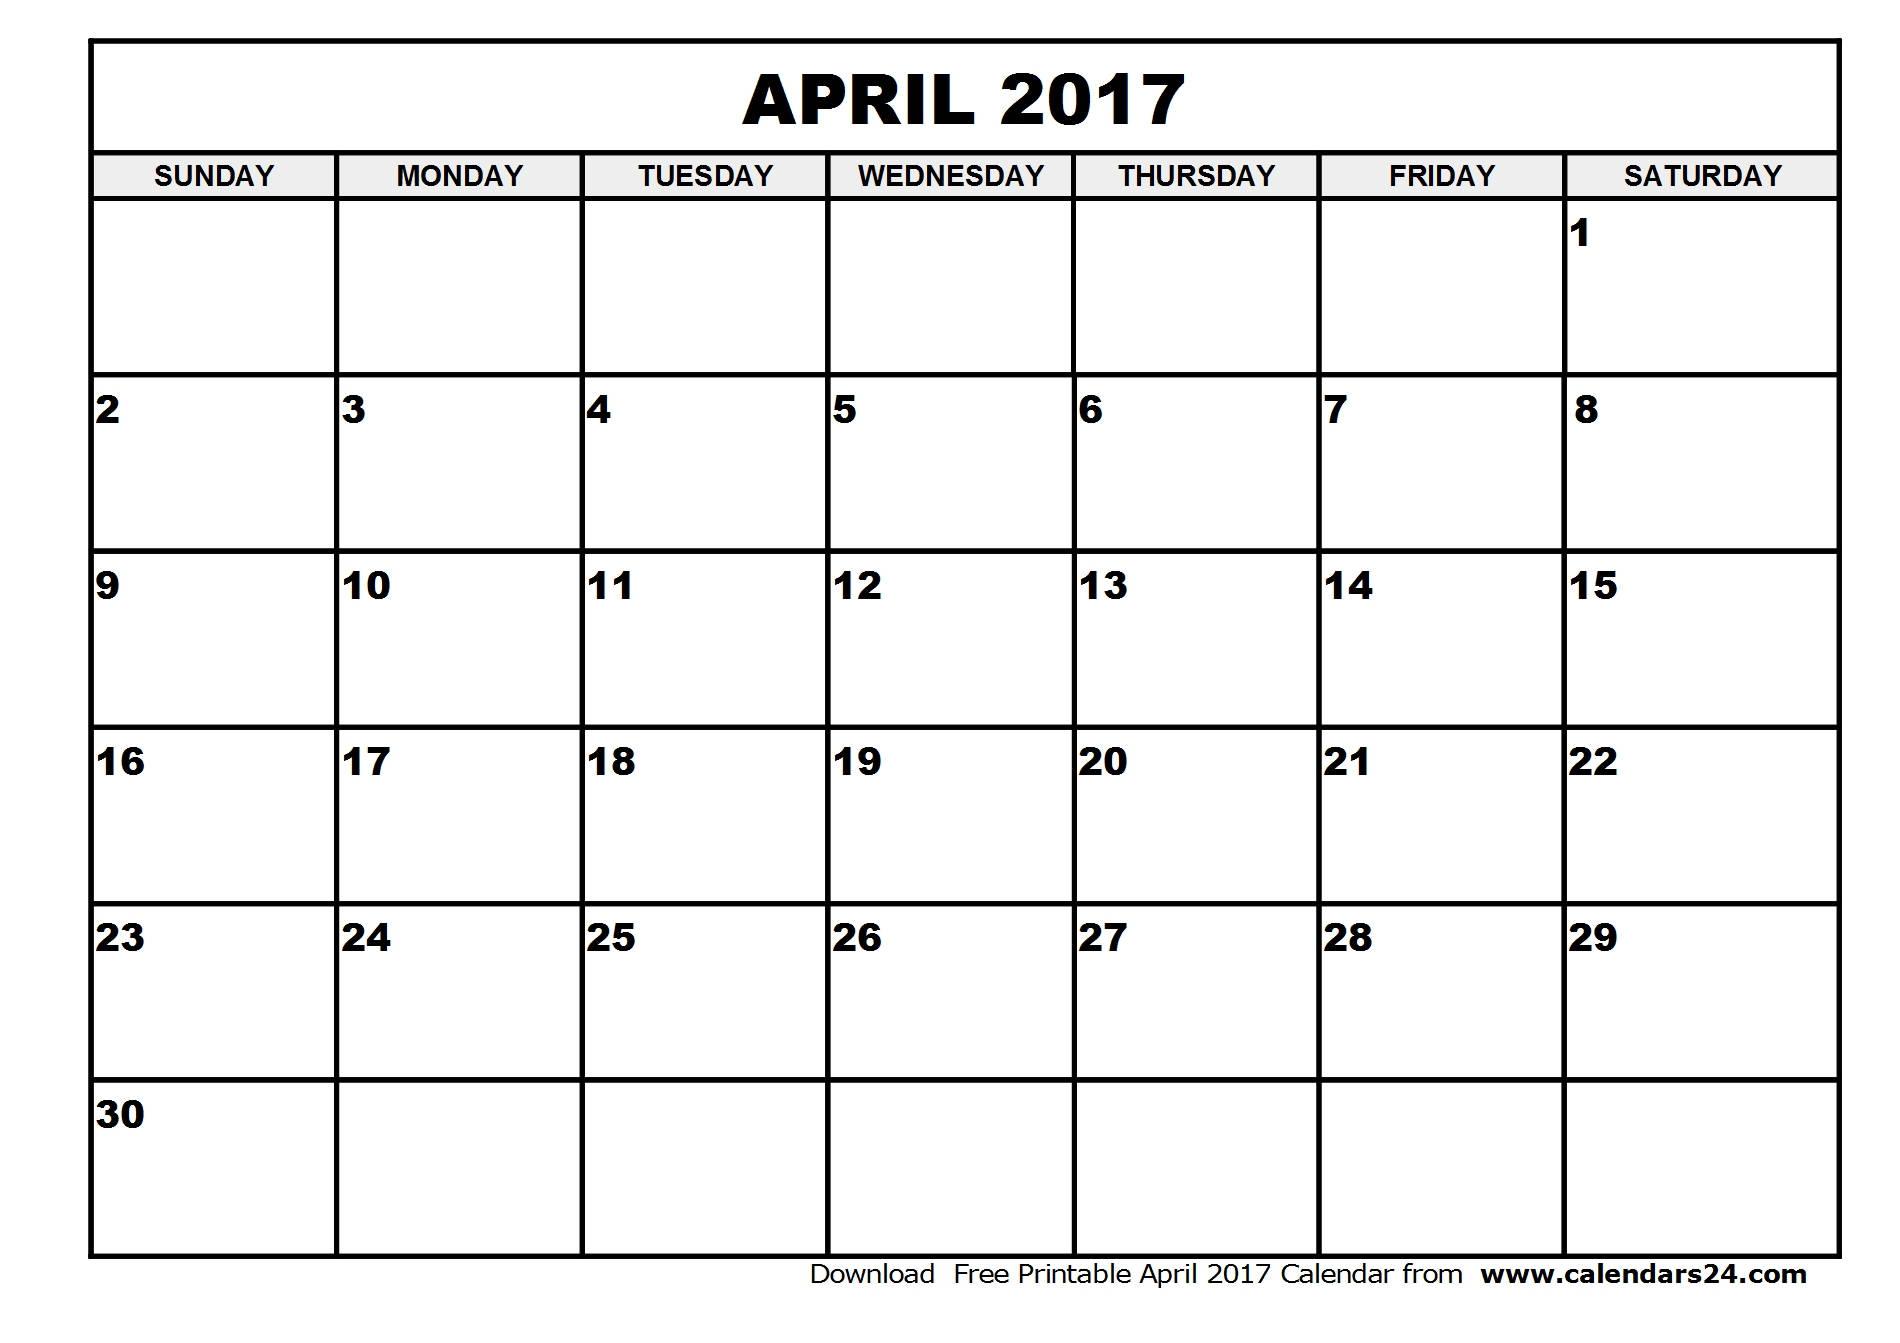 April 2017 Calendar & May 2017 Calendar